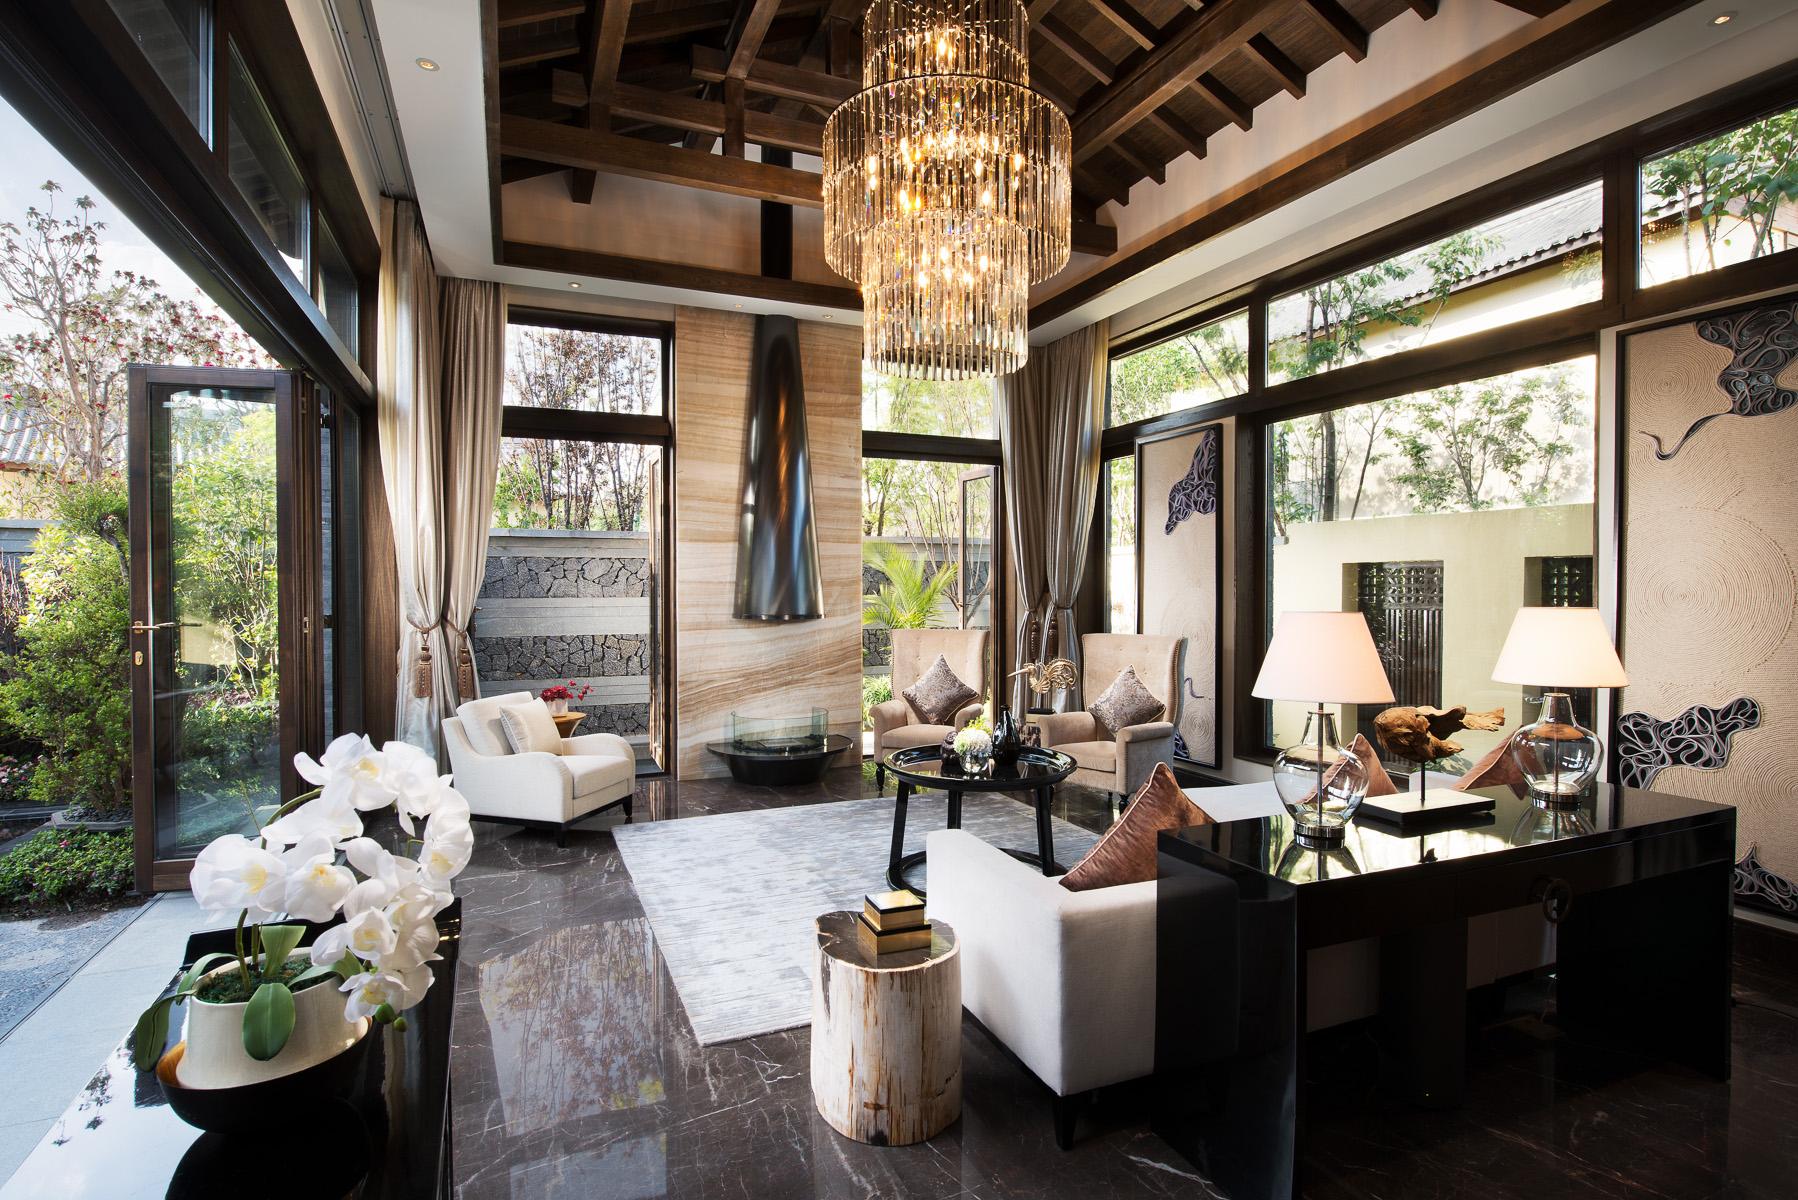 20140430_HBA_LiJiang-Villa_DuiXue_Livingroom_F2.jpg